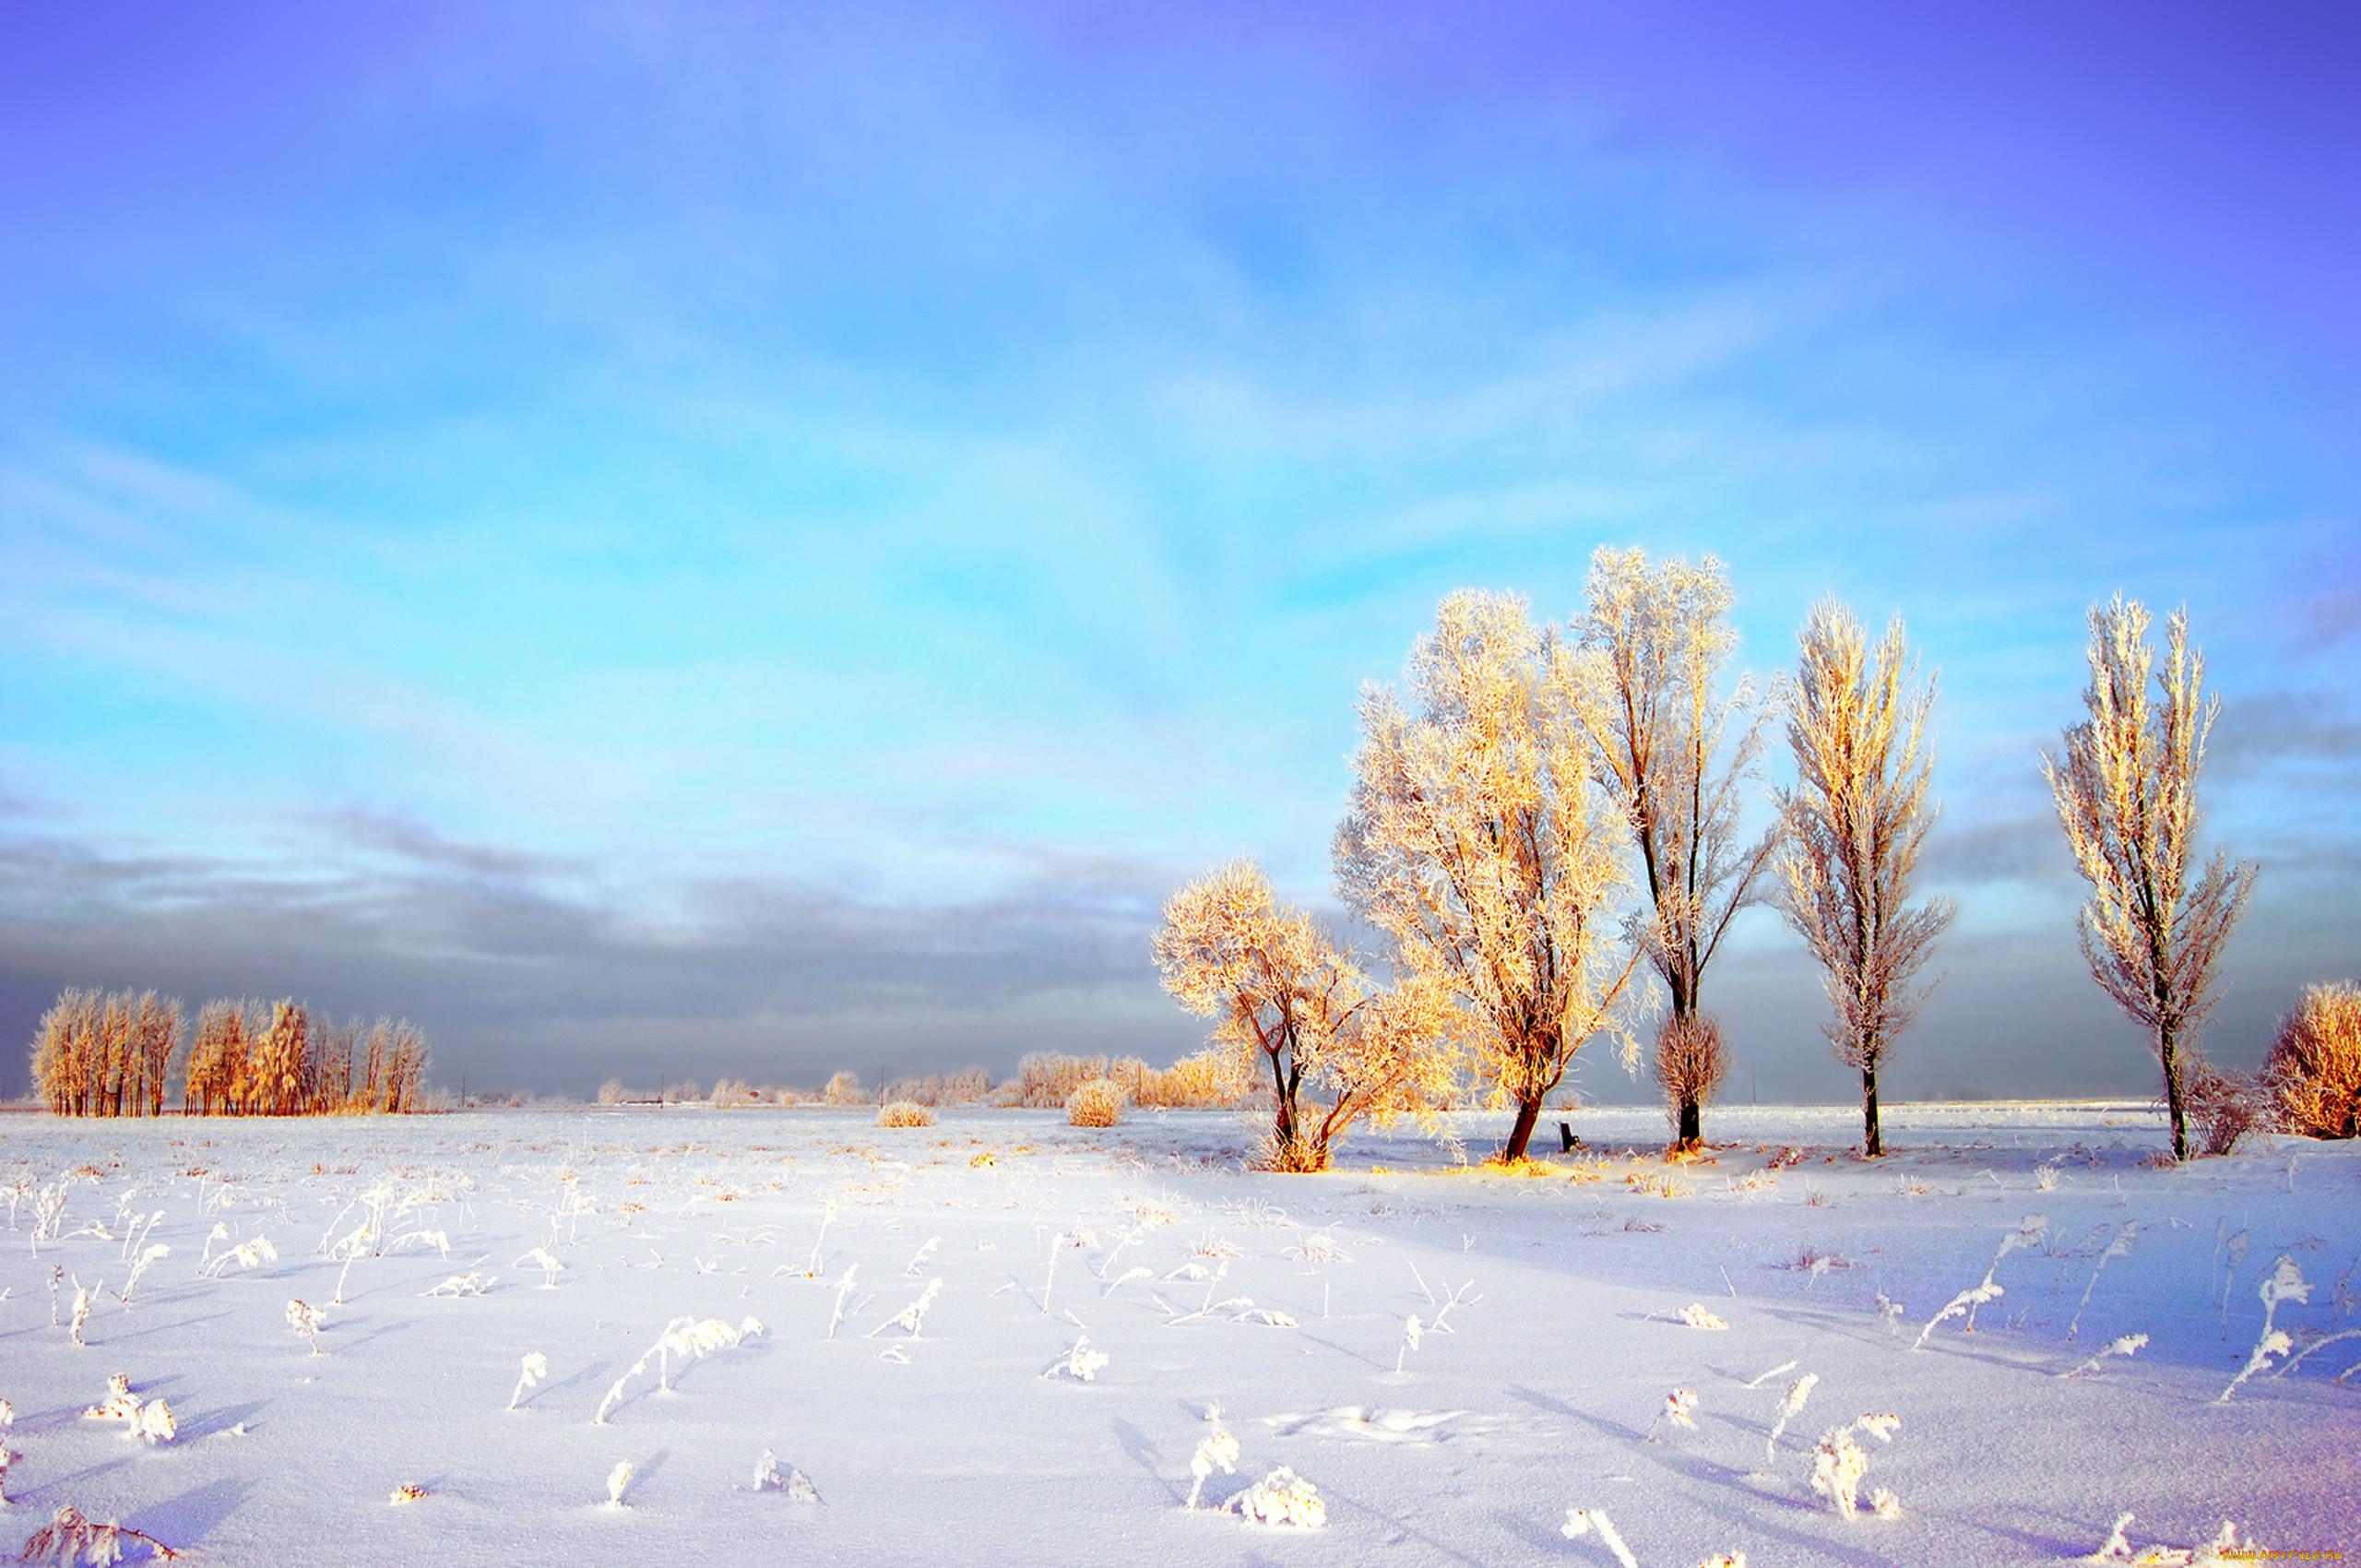 картинки на рабочий стол небо солнце снег